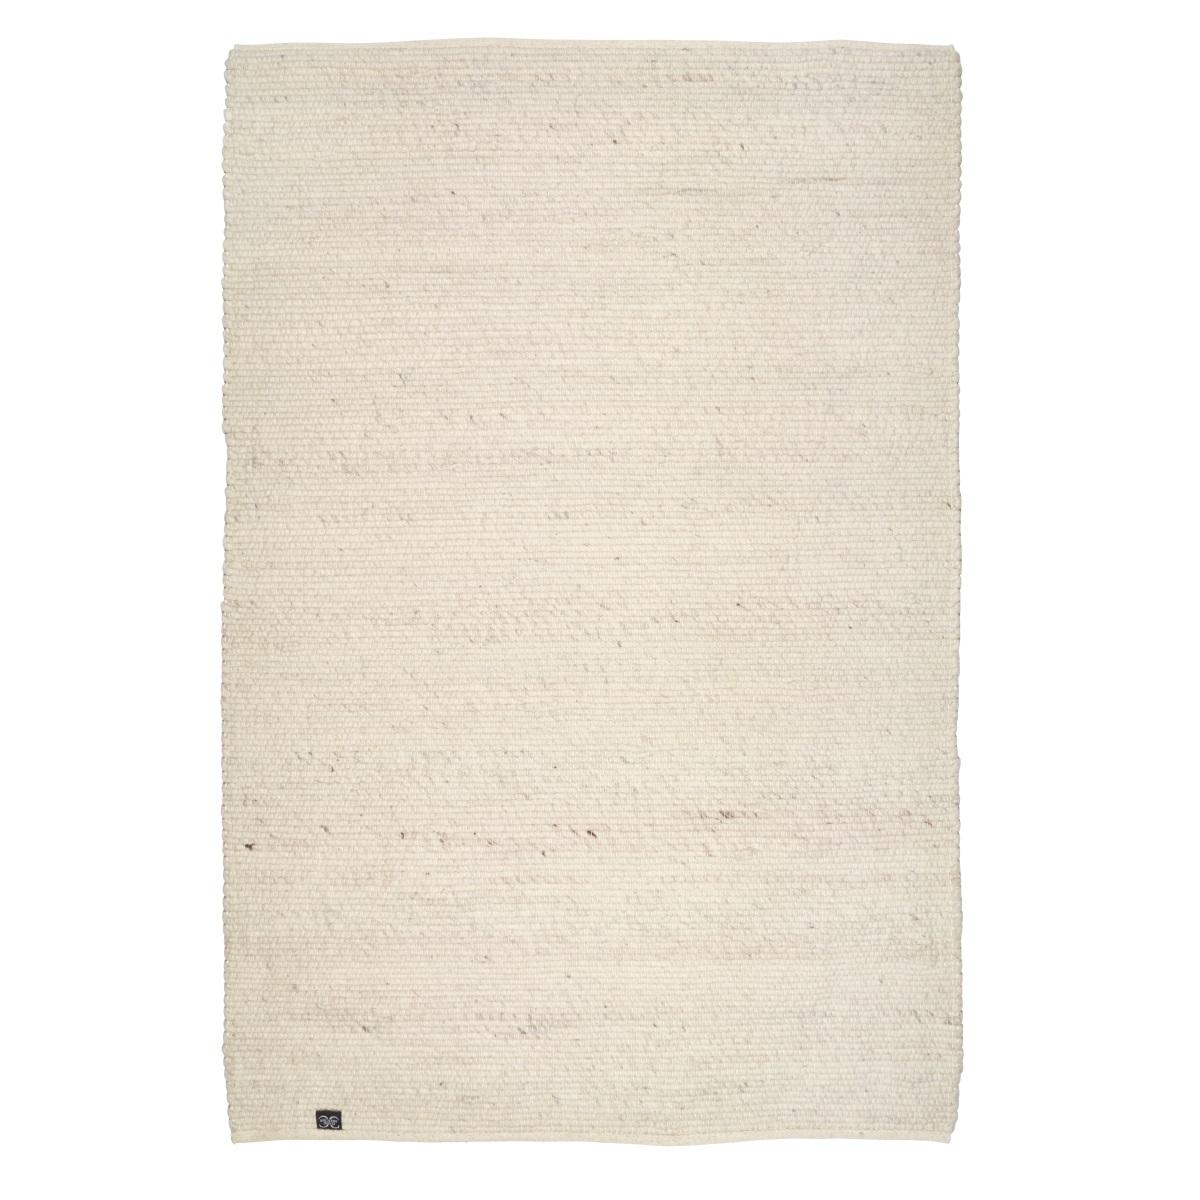 Ullmatta Merino vit 300 x 400 cm Classic Collection